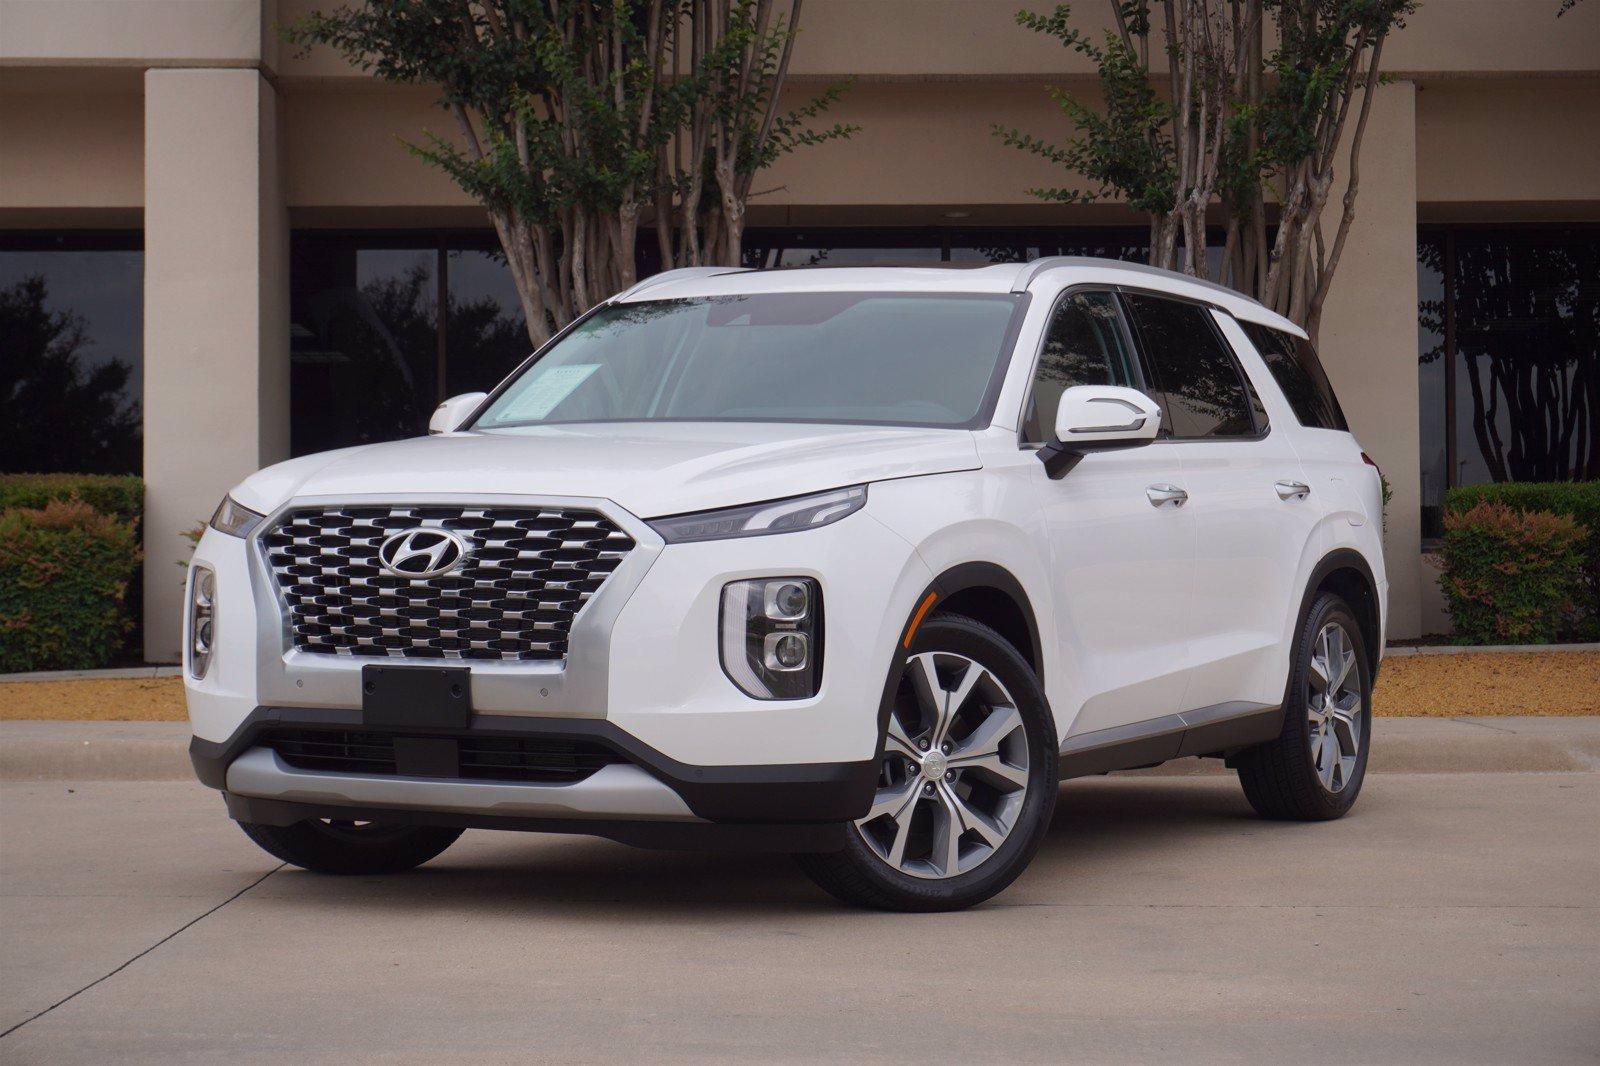 2020 Hyundai Palisade Vehicle Photo in Grapevine, TX 76051